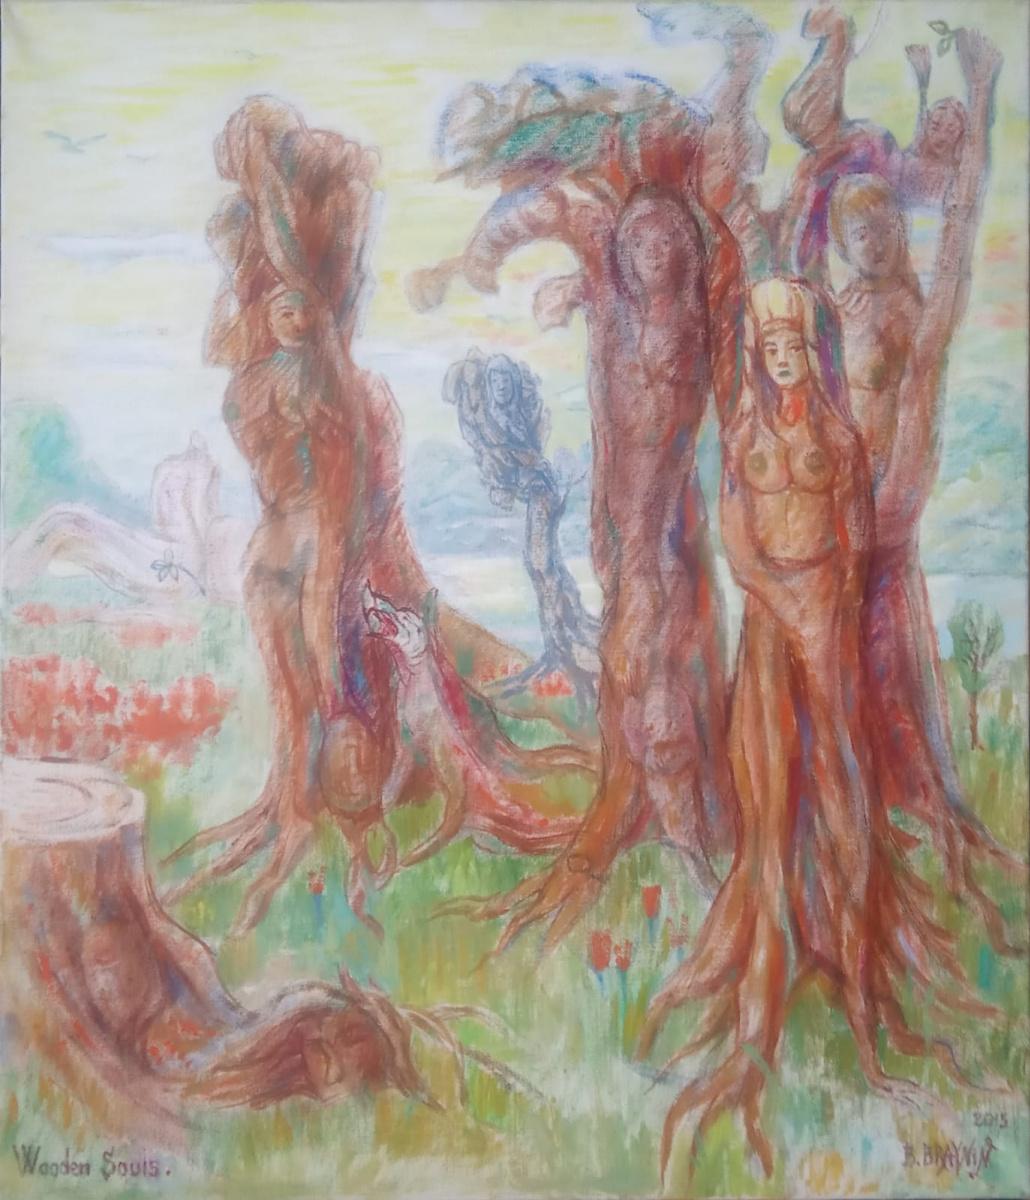 Boris Braynin. Wooden Souis